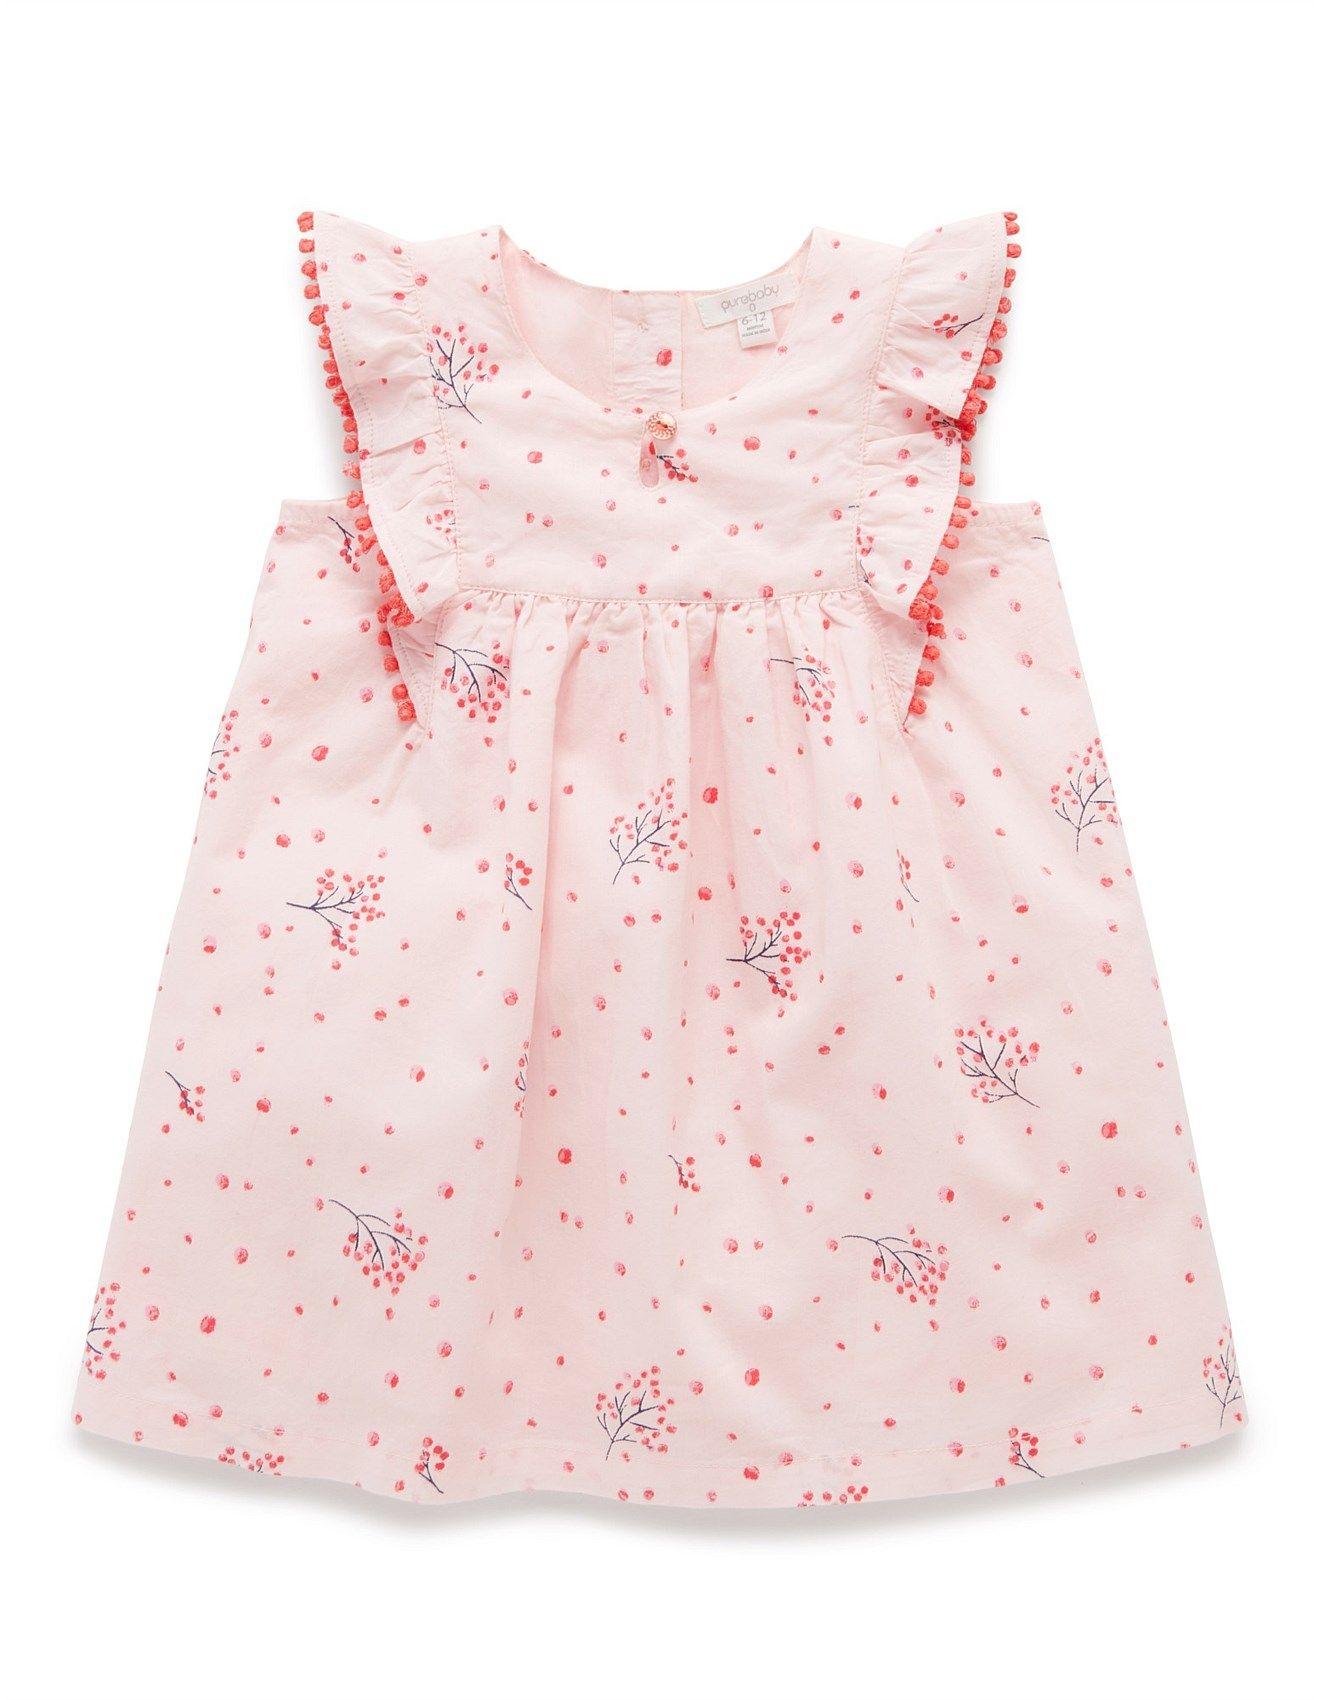 2b0fb2d55b1ba Baby Clothing   Baby Boy & Baby Girl Clothes   David Jones - SKIPPING DRESS